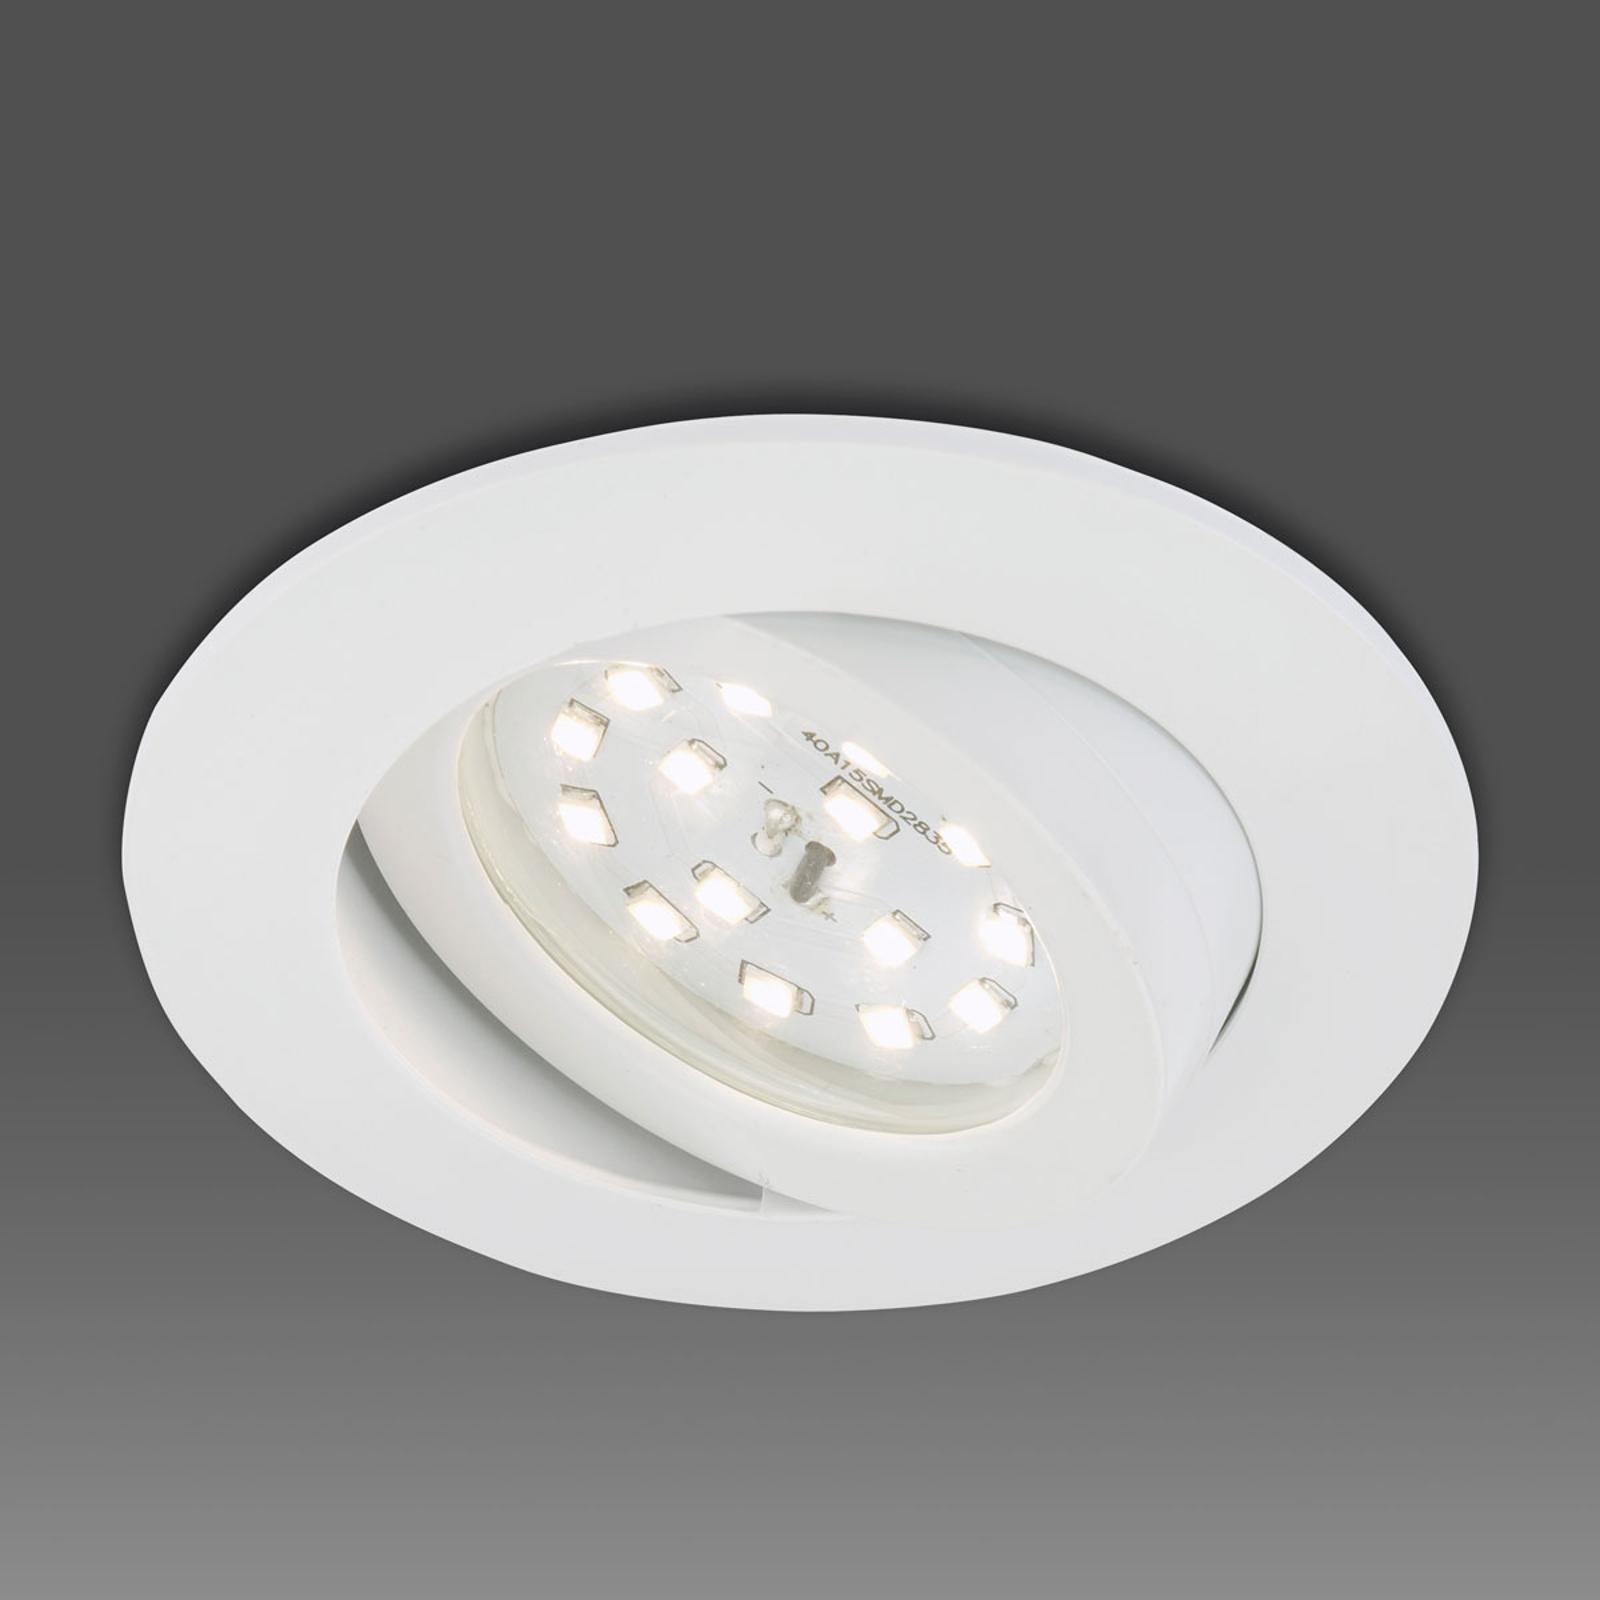 Draaibare LED inbouwspot Erik wit